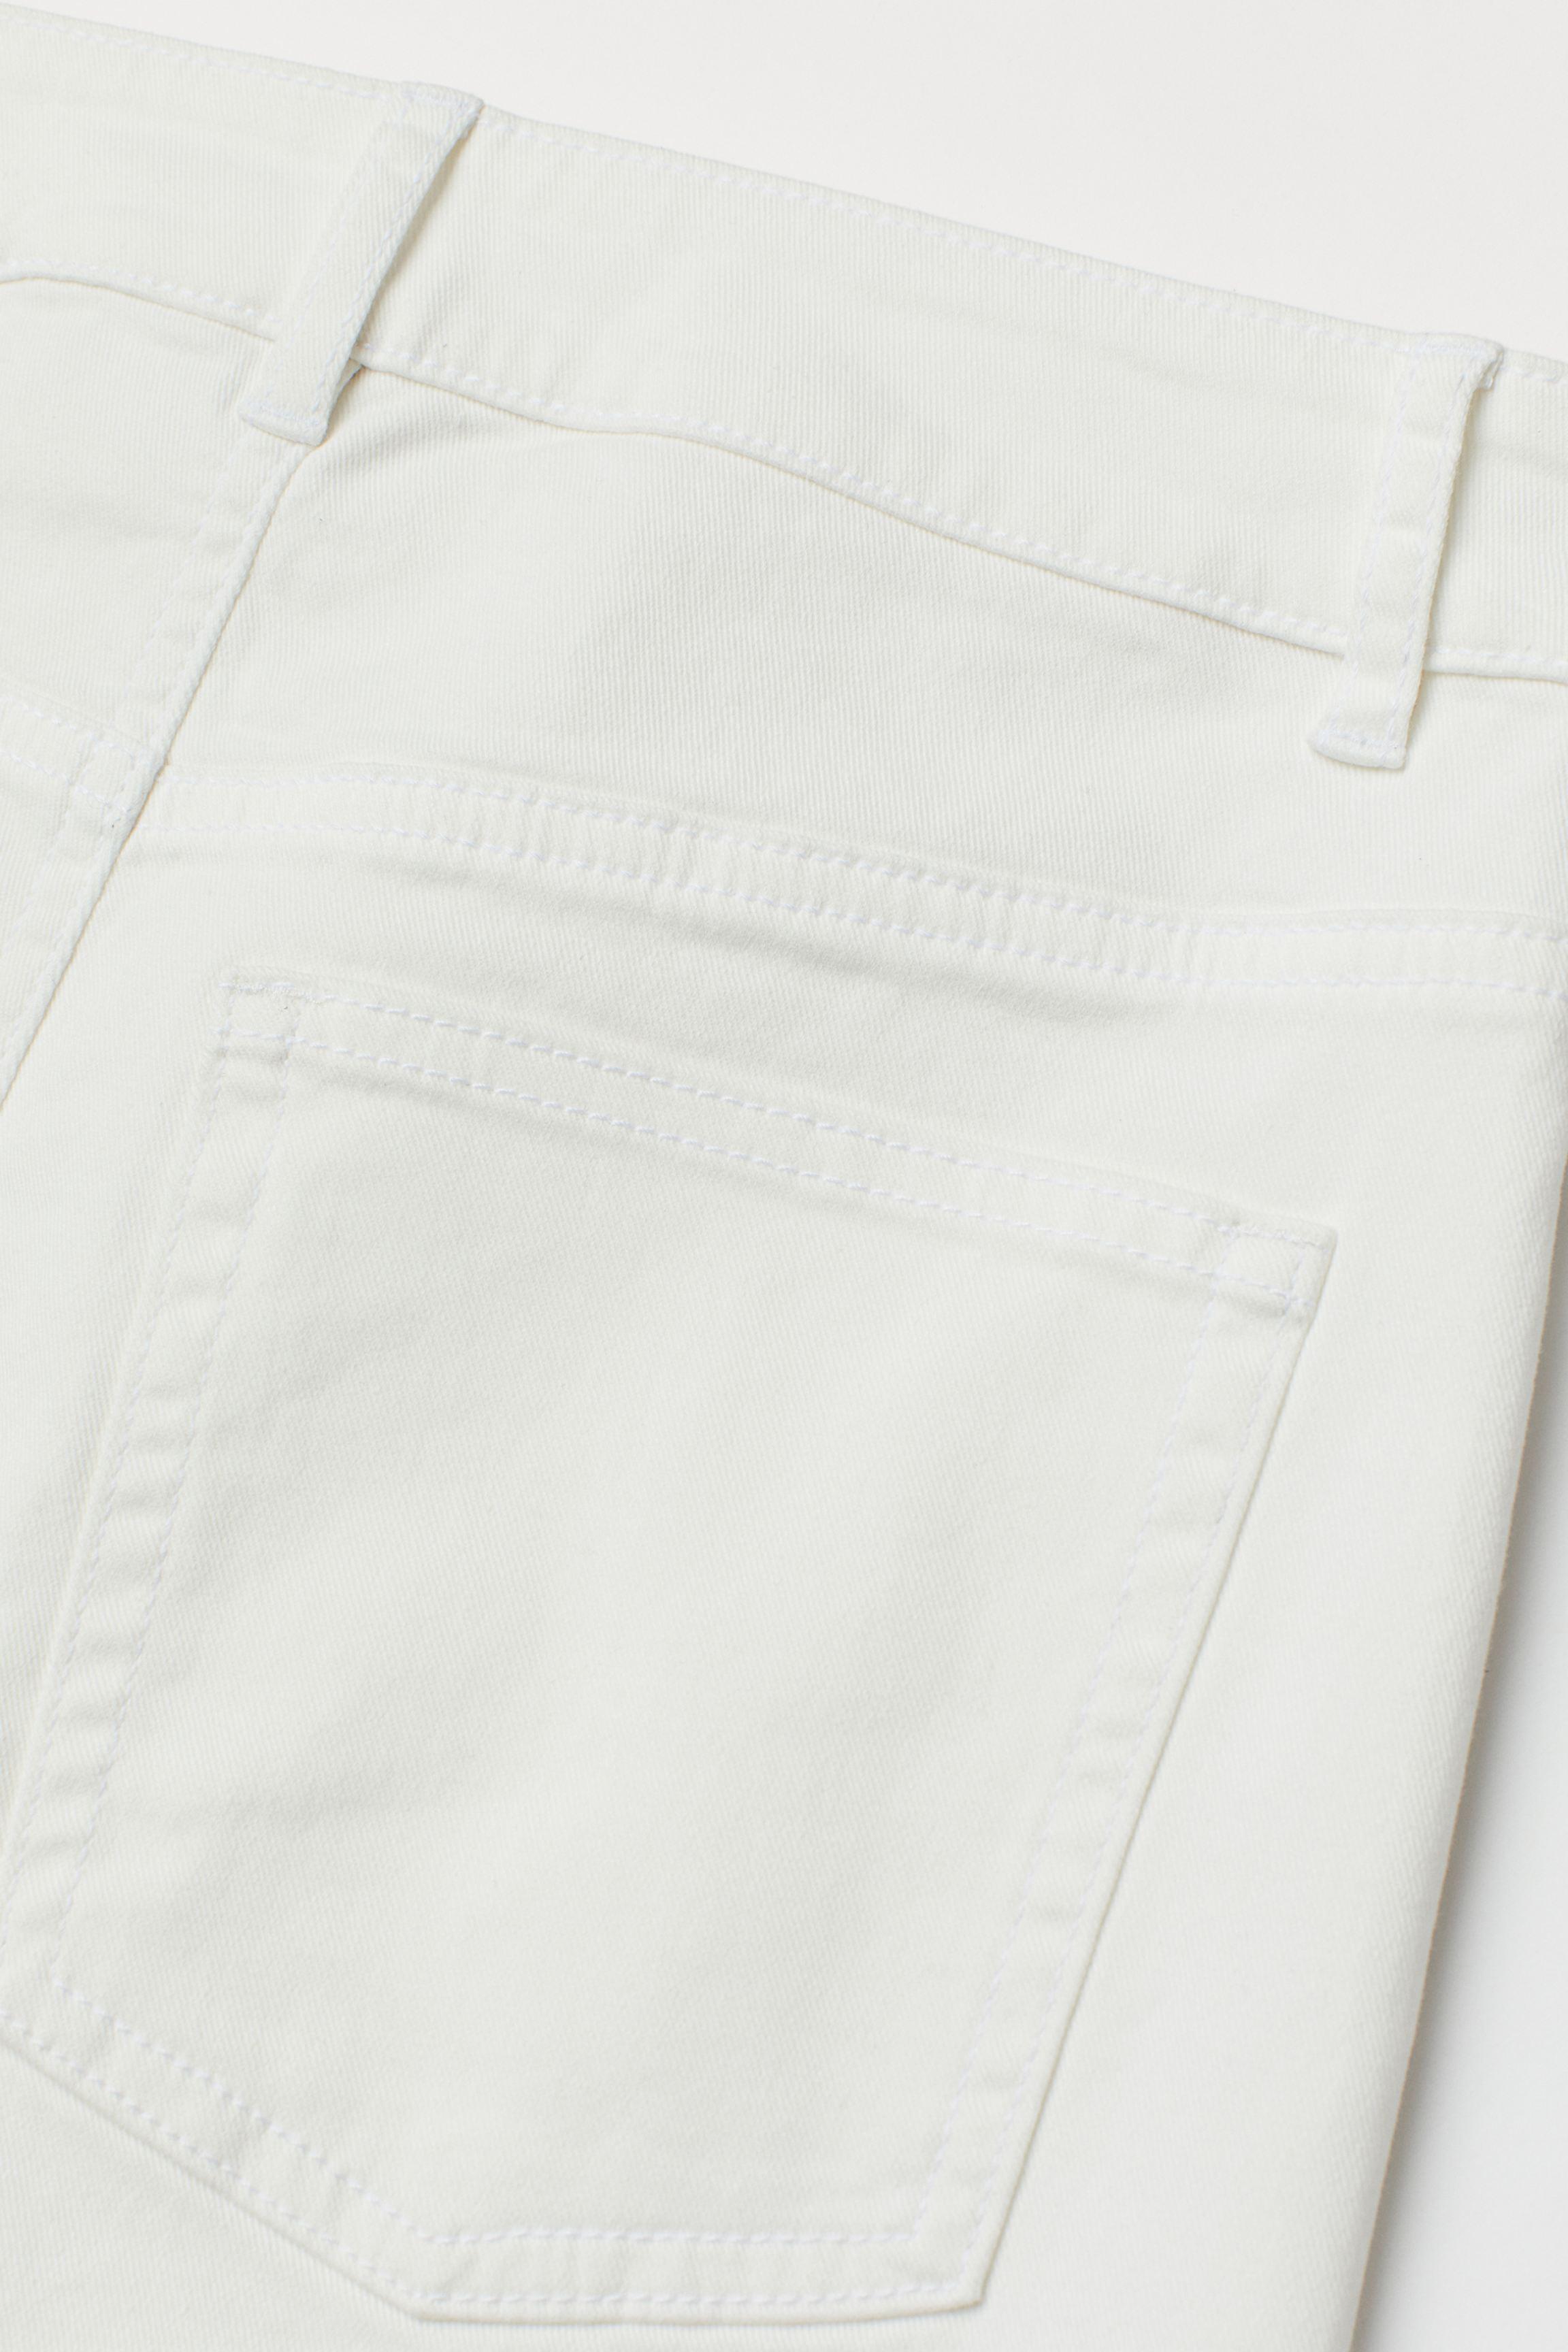 Twill Shorts High Waist